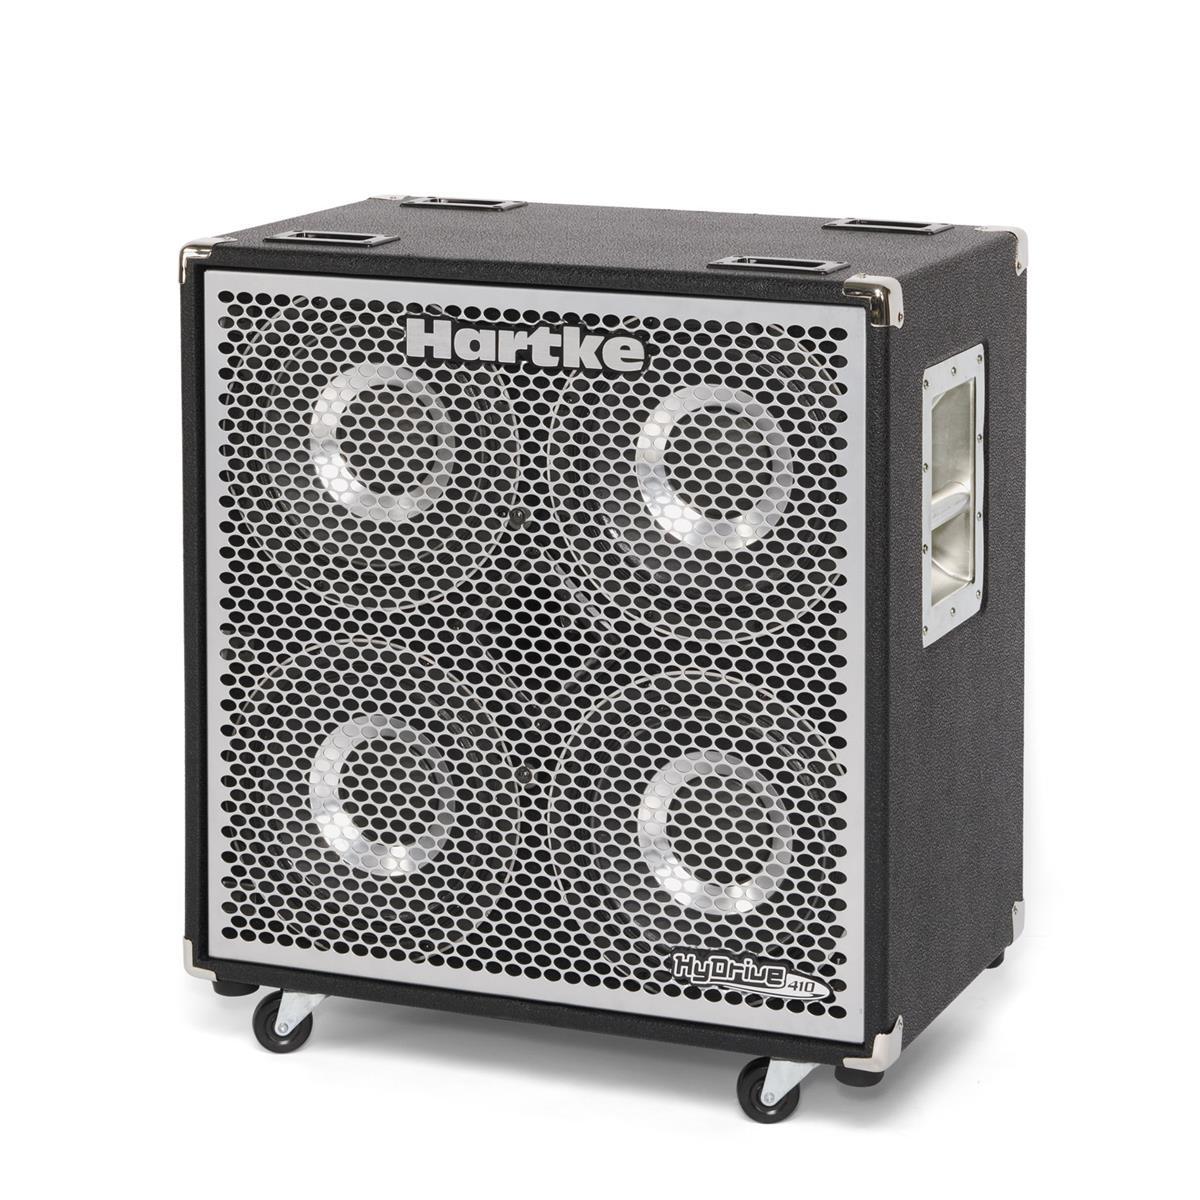 Hartke HyDrive HD410 - 4x10 -  1000W